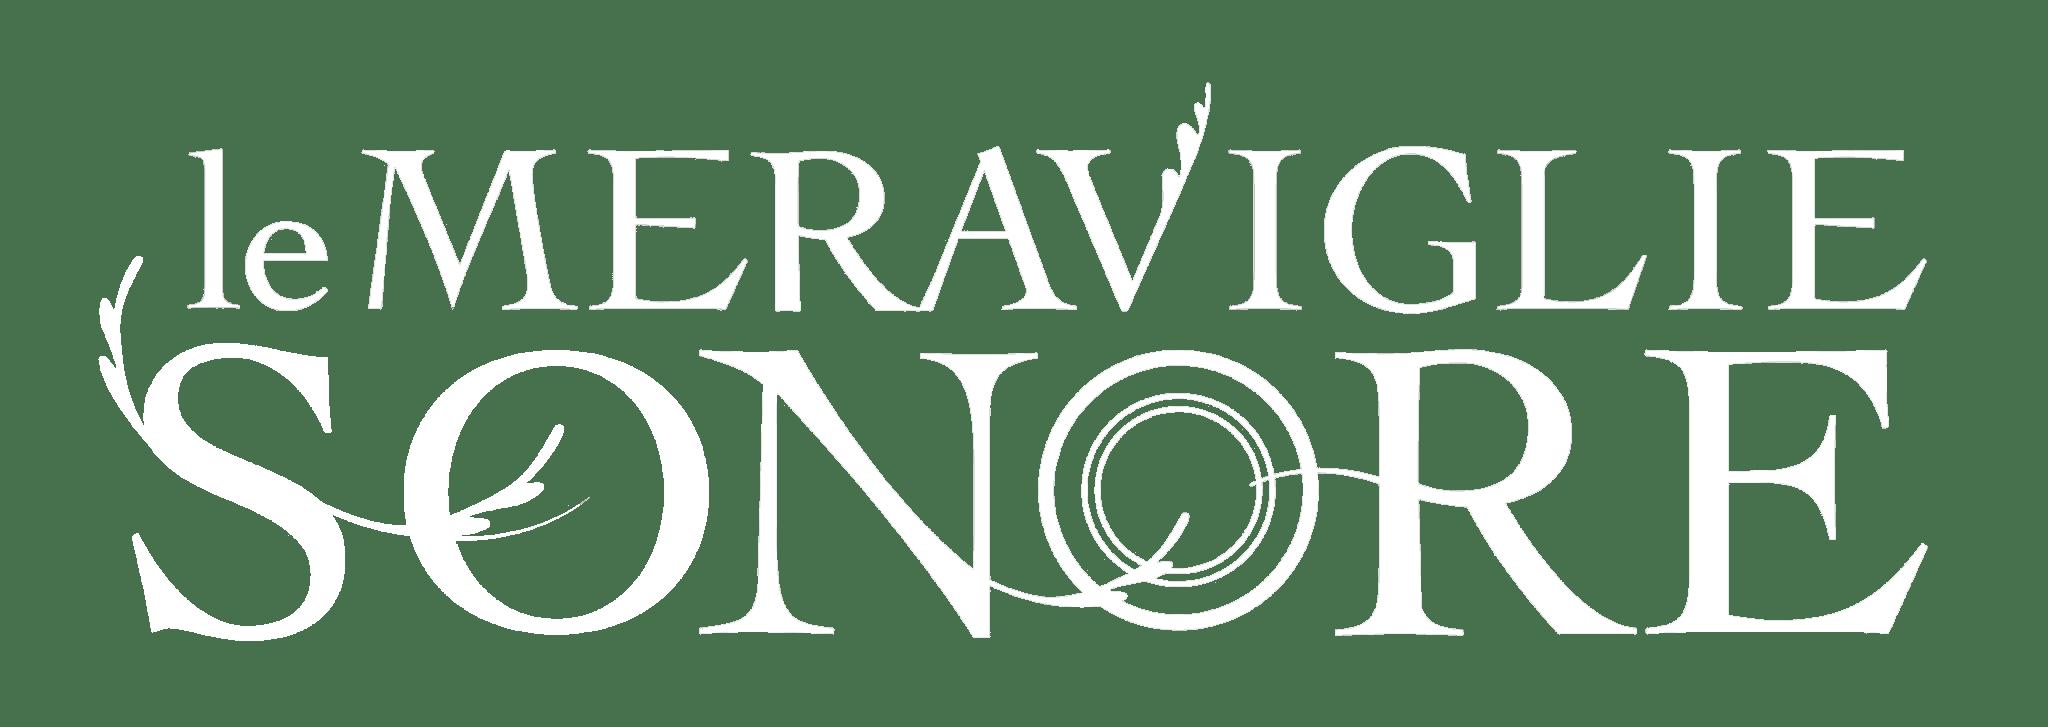 Le Meraviglie Sonore Sara Usai Logo